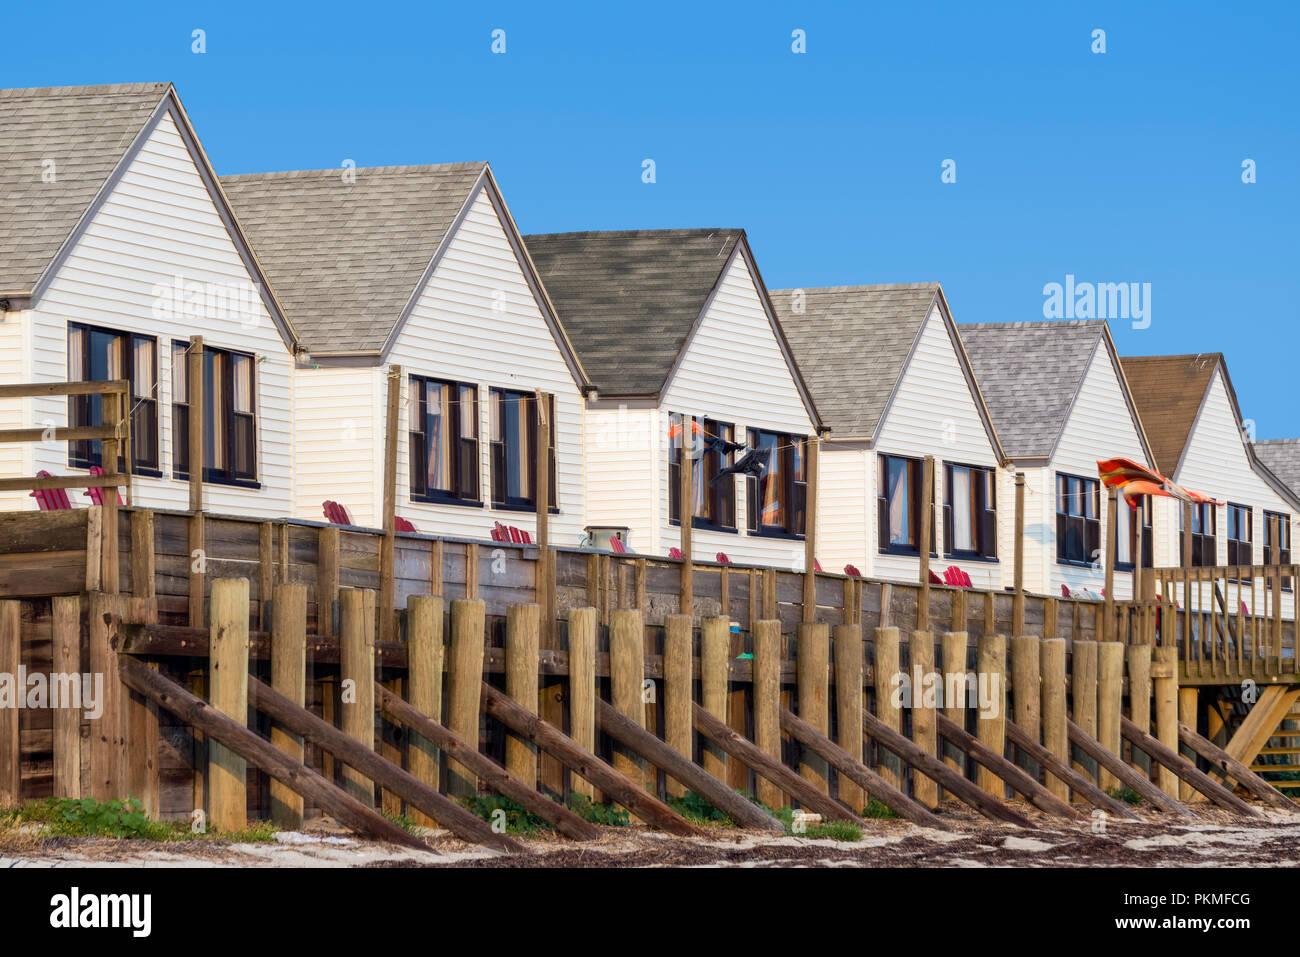 Astounding Beachfront Rental Cottages Truro Cape Cod Massachusetts Download Free Architecture Designs Scobabritishbridgeorg